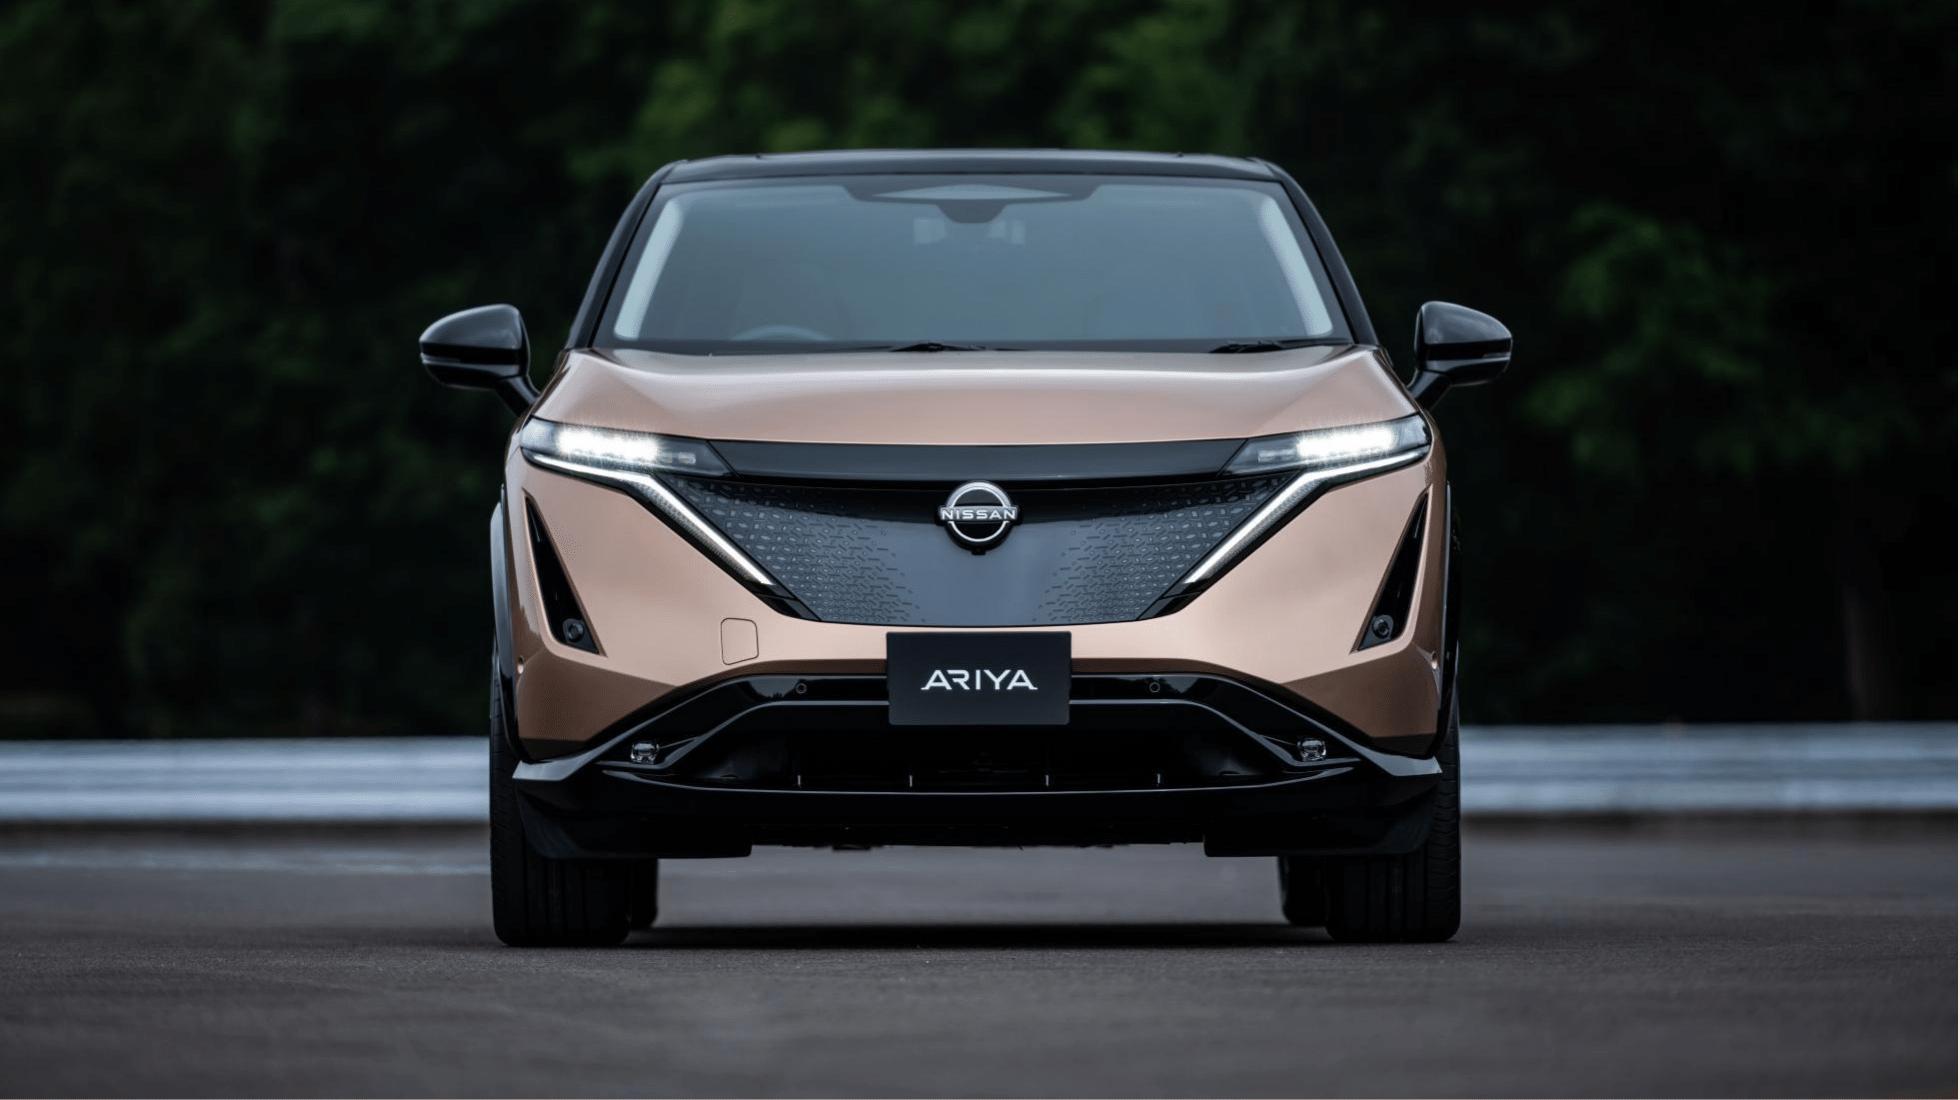 The Nissan Ariya is a big EV with over 500km range